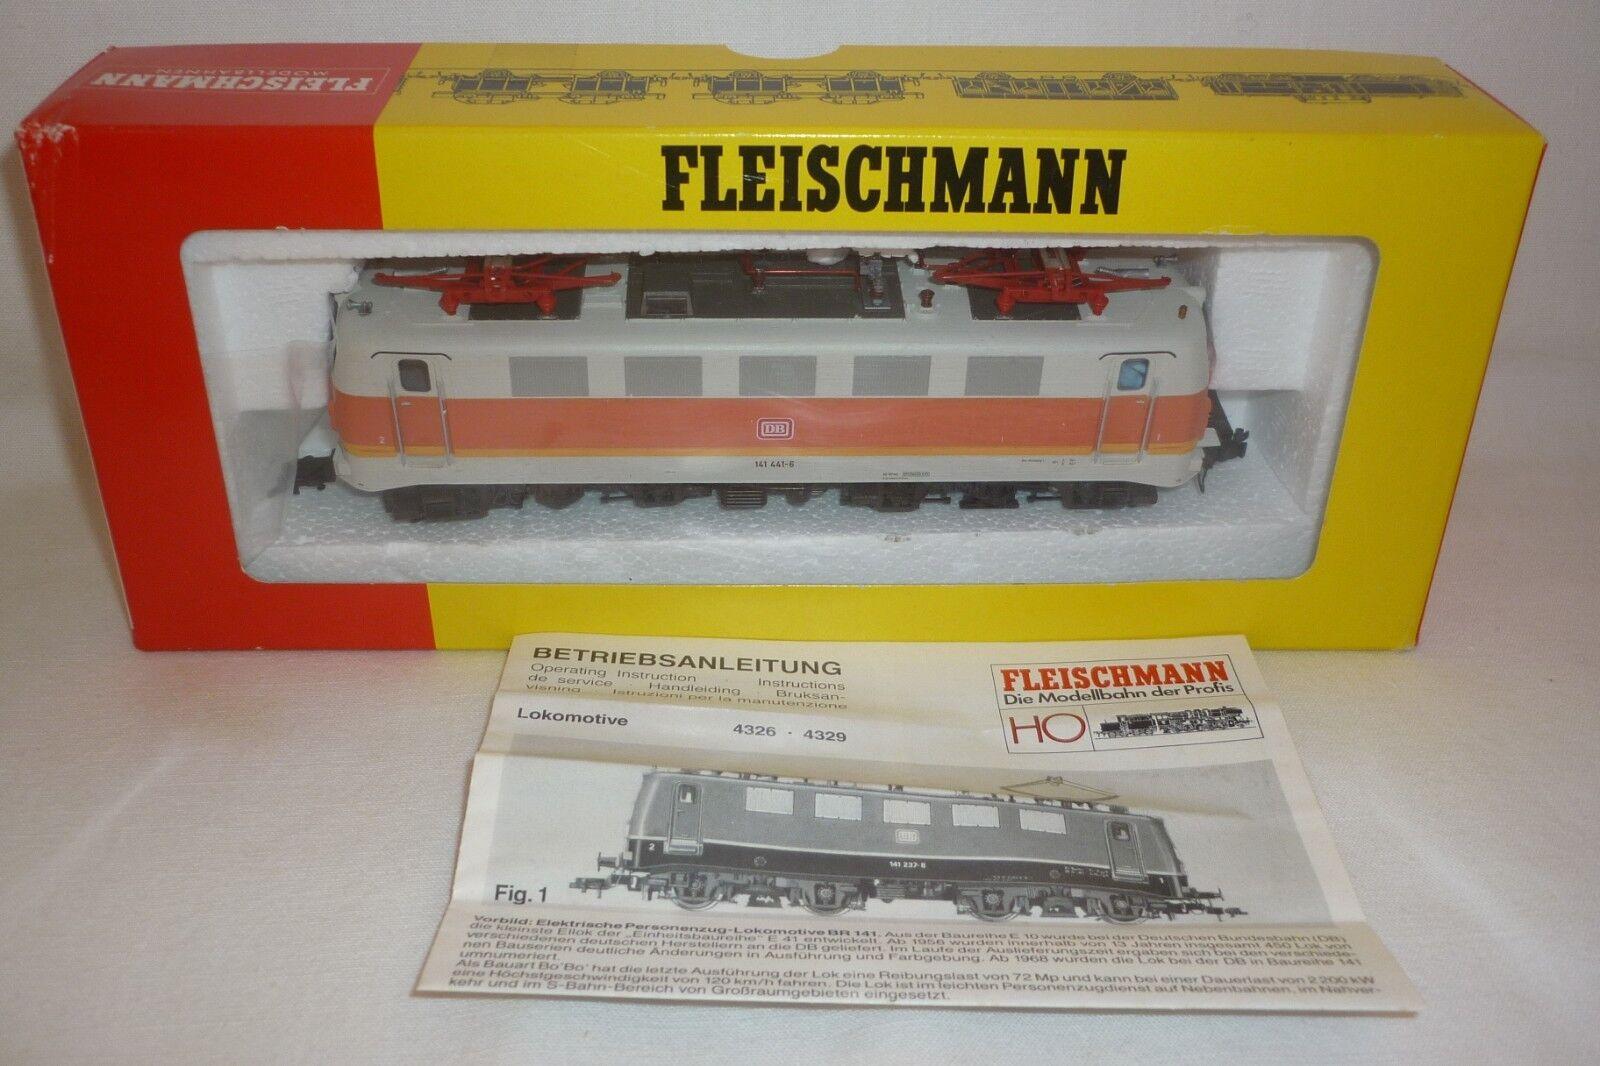 FLEISCHMANN - SPUR H0 - 4329 ELEKTRO LOKOMOTIVE DB 141 441-6  -  OVP (8.EI-79)